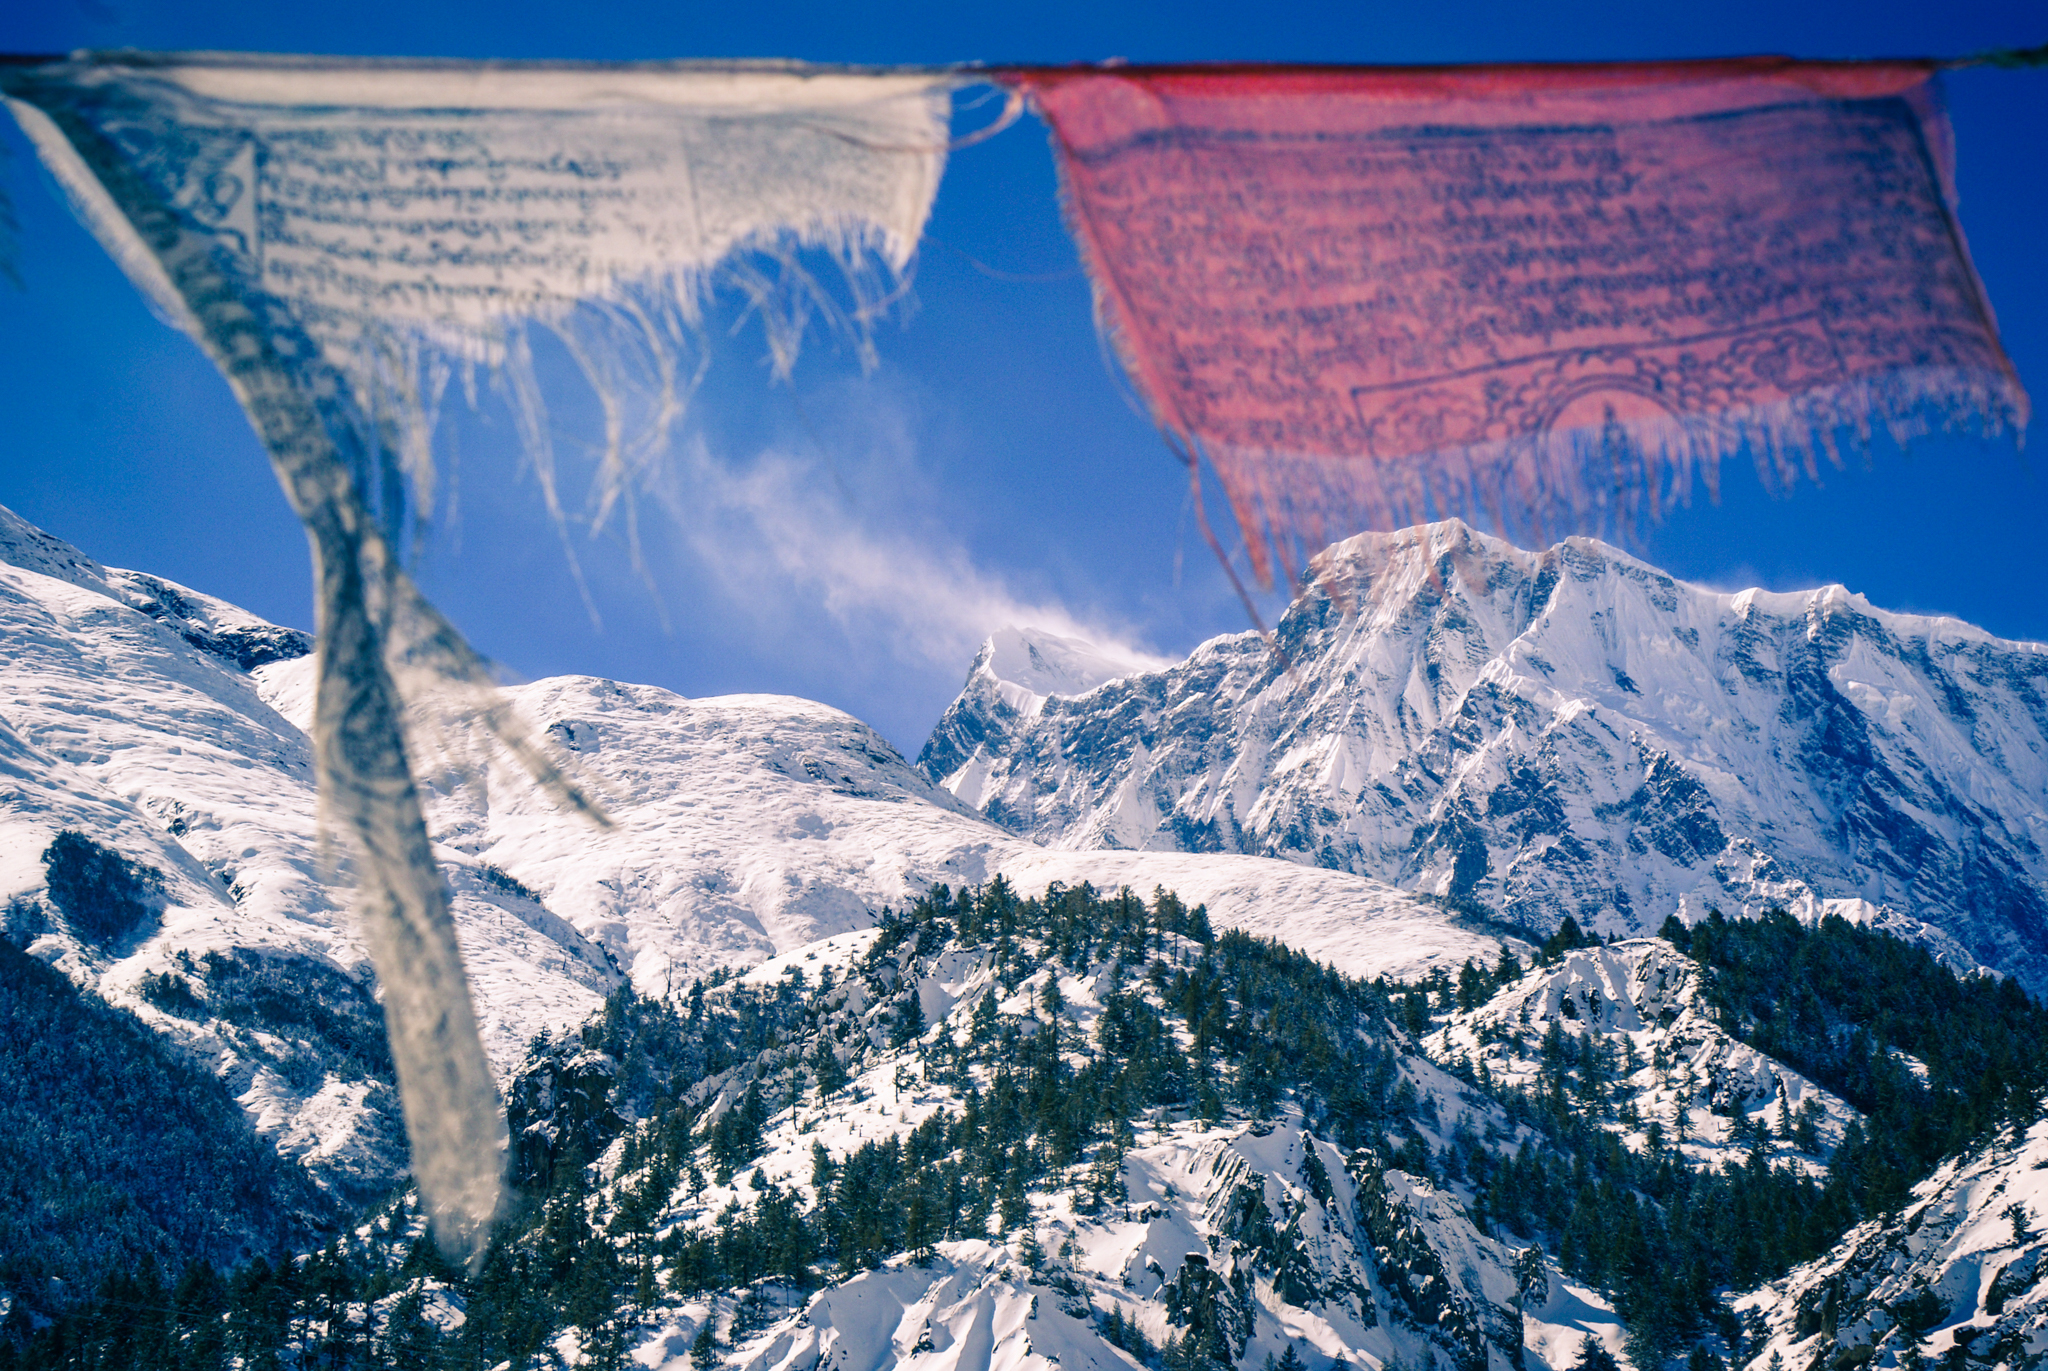 Himalayas, Annapurna region, Nepal